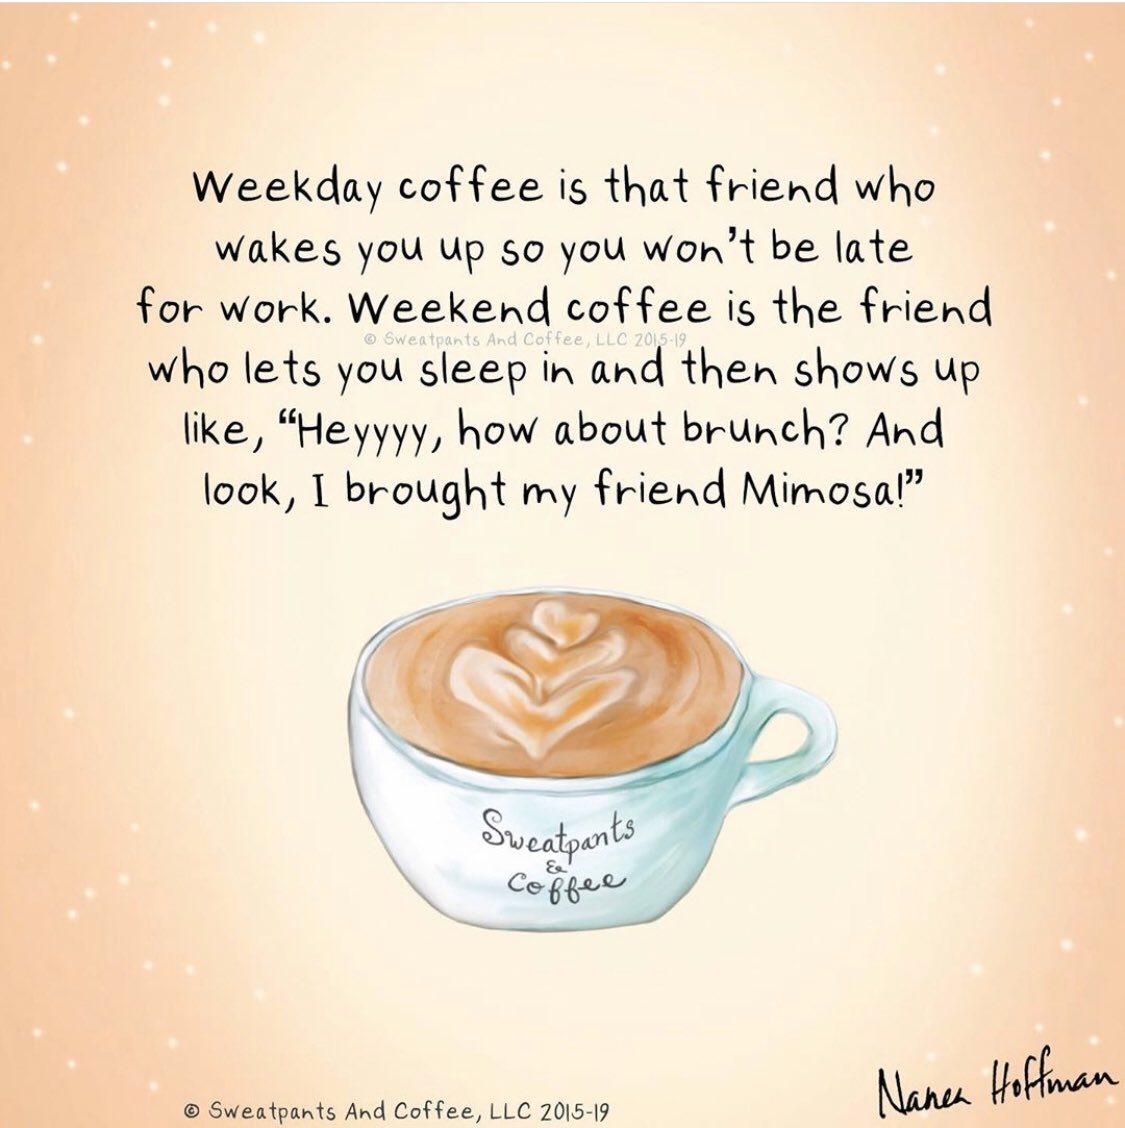 Sweatpants Coffee On Twitter Happy Saturday Coffee Coffeetime Coffeelover Coffeequotes Coffeememe Sweatpantsandcoffee